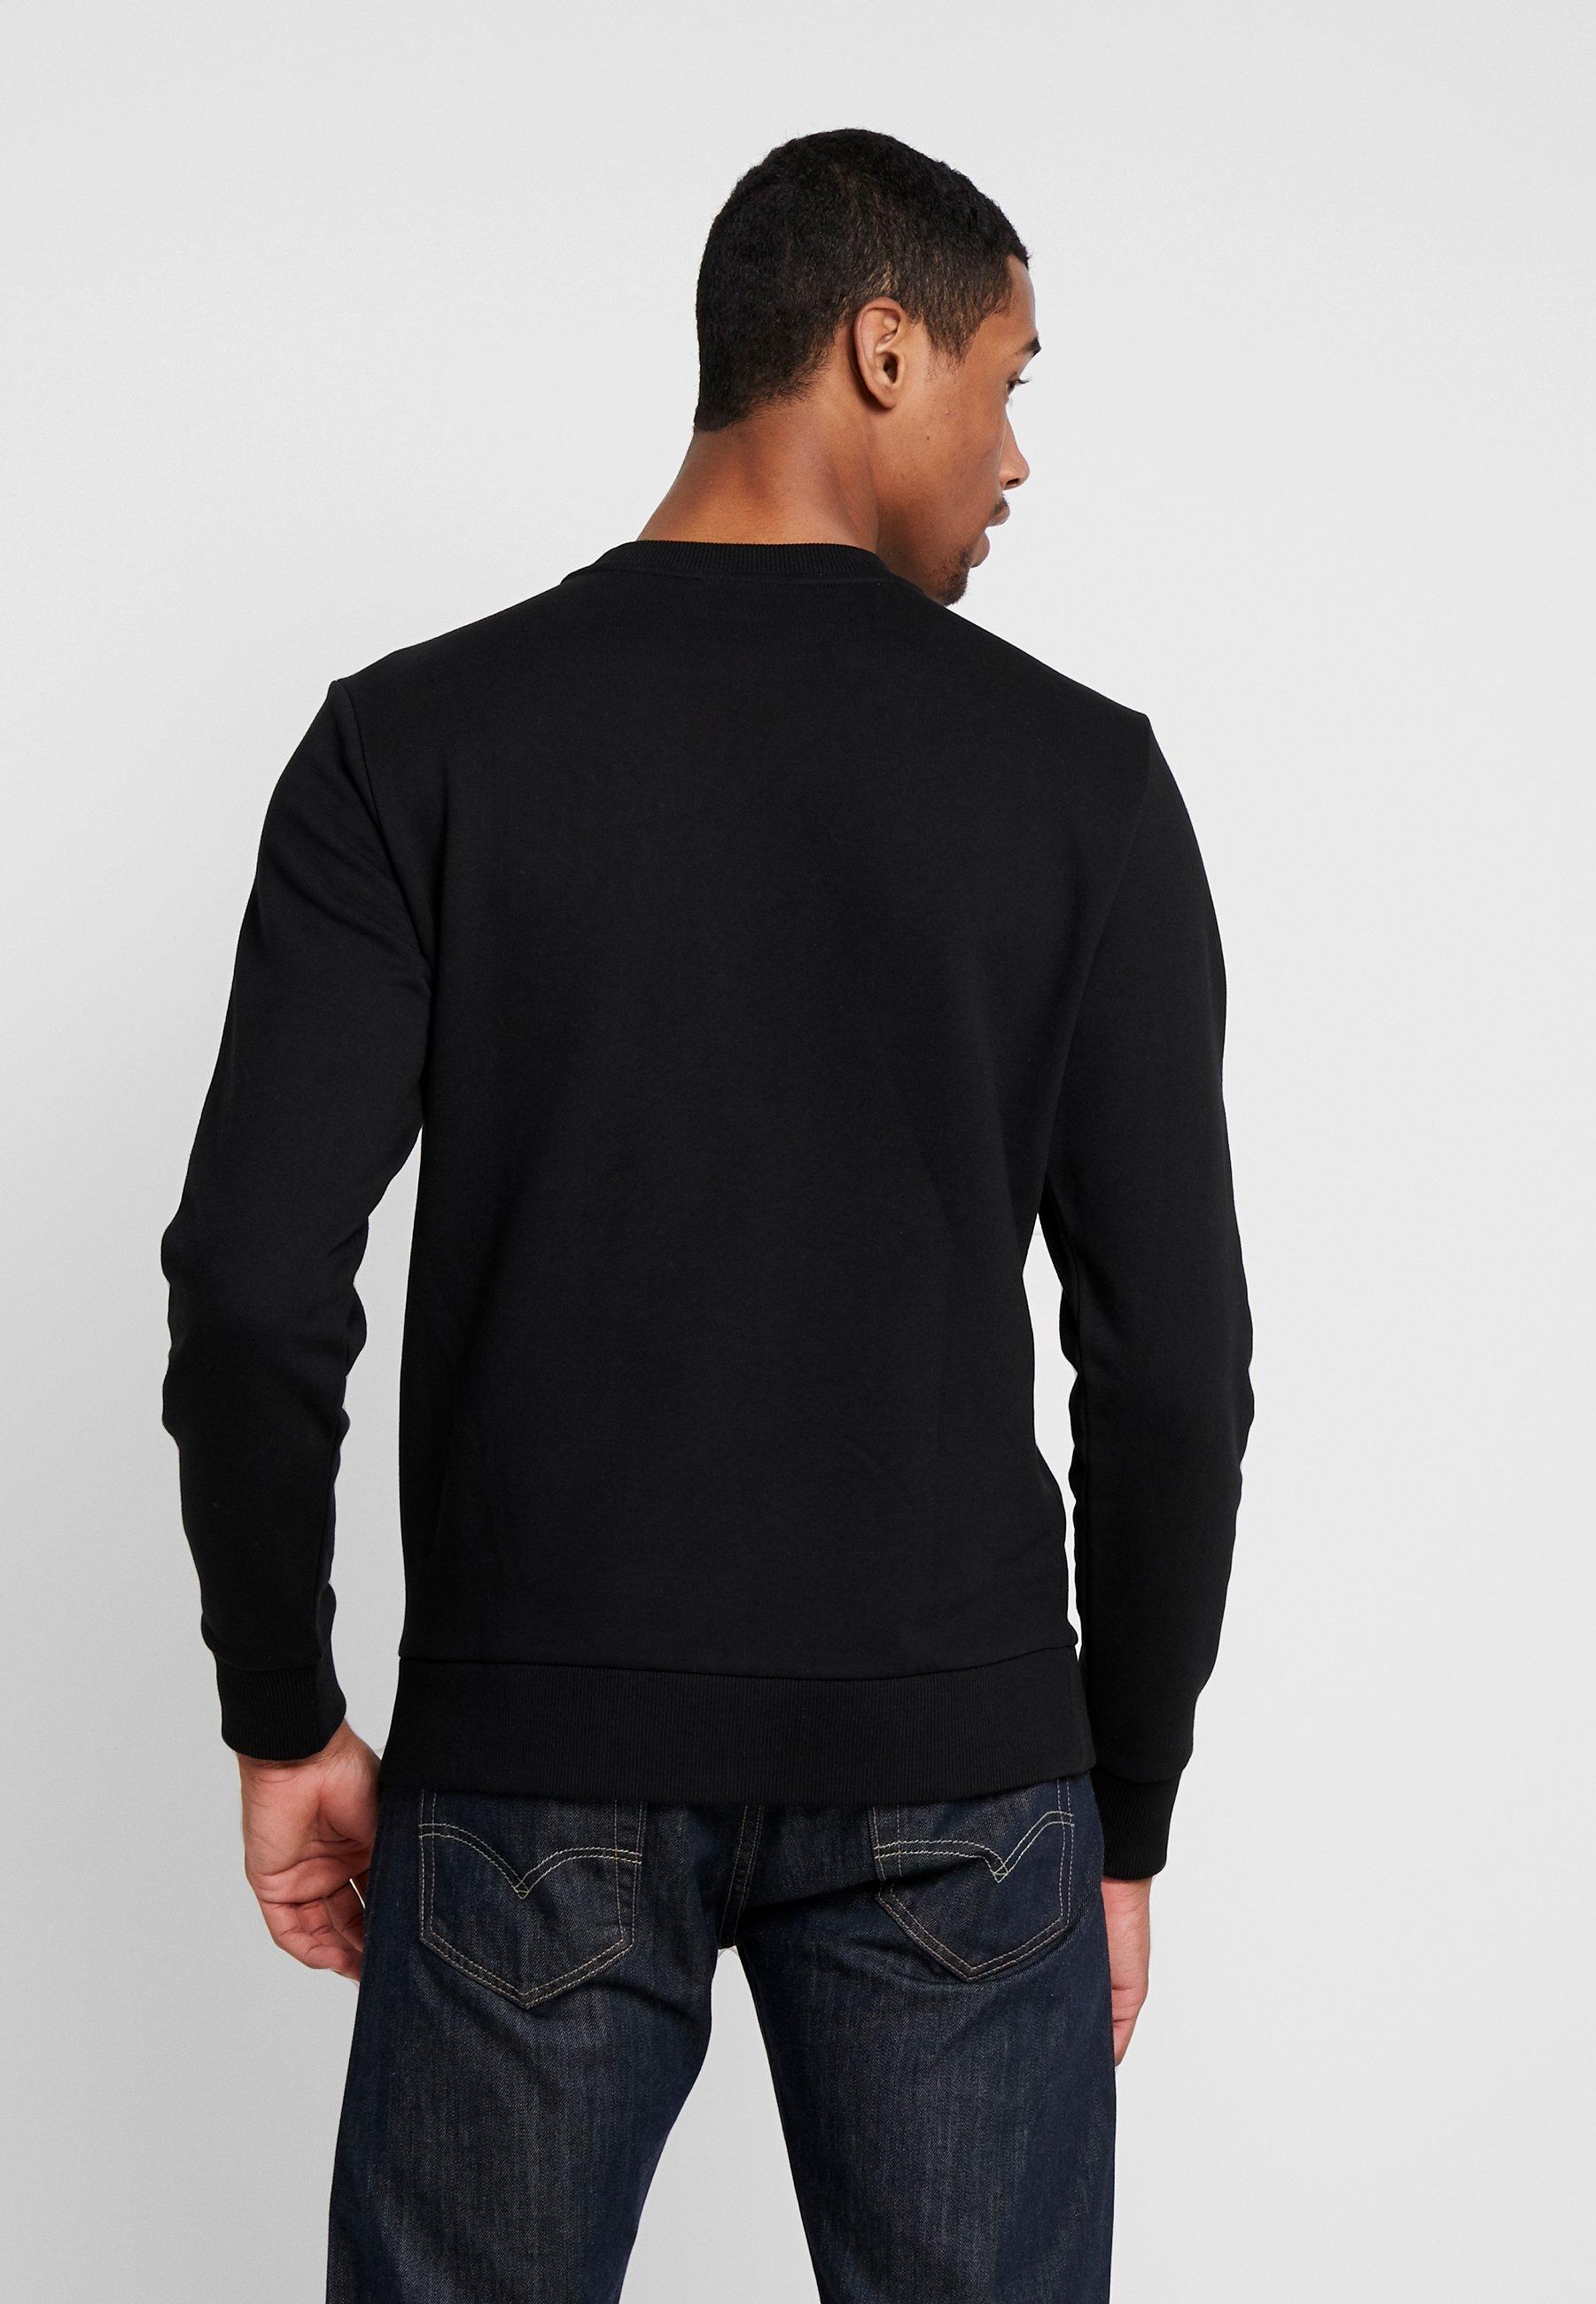 Klein Black Calvin Calvin Athleisure LogoSweatshirt xBoQdrECeW